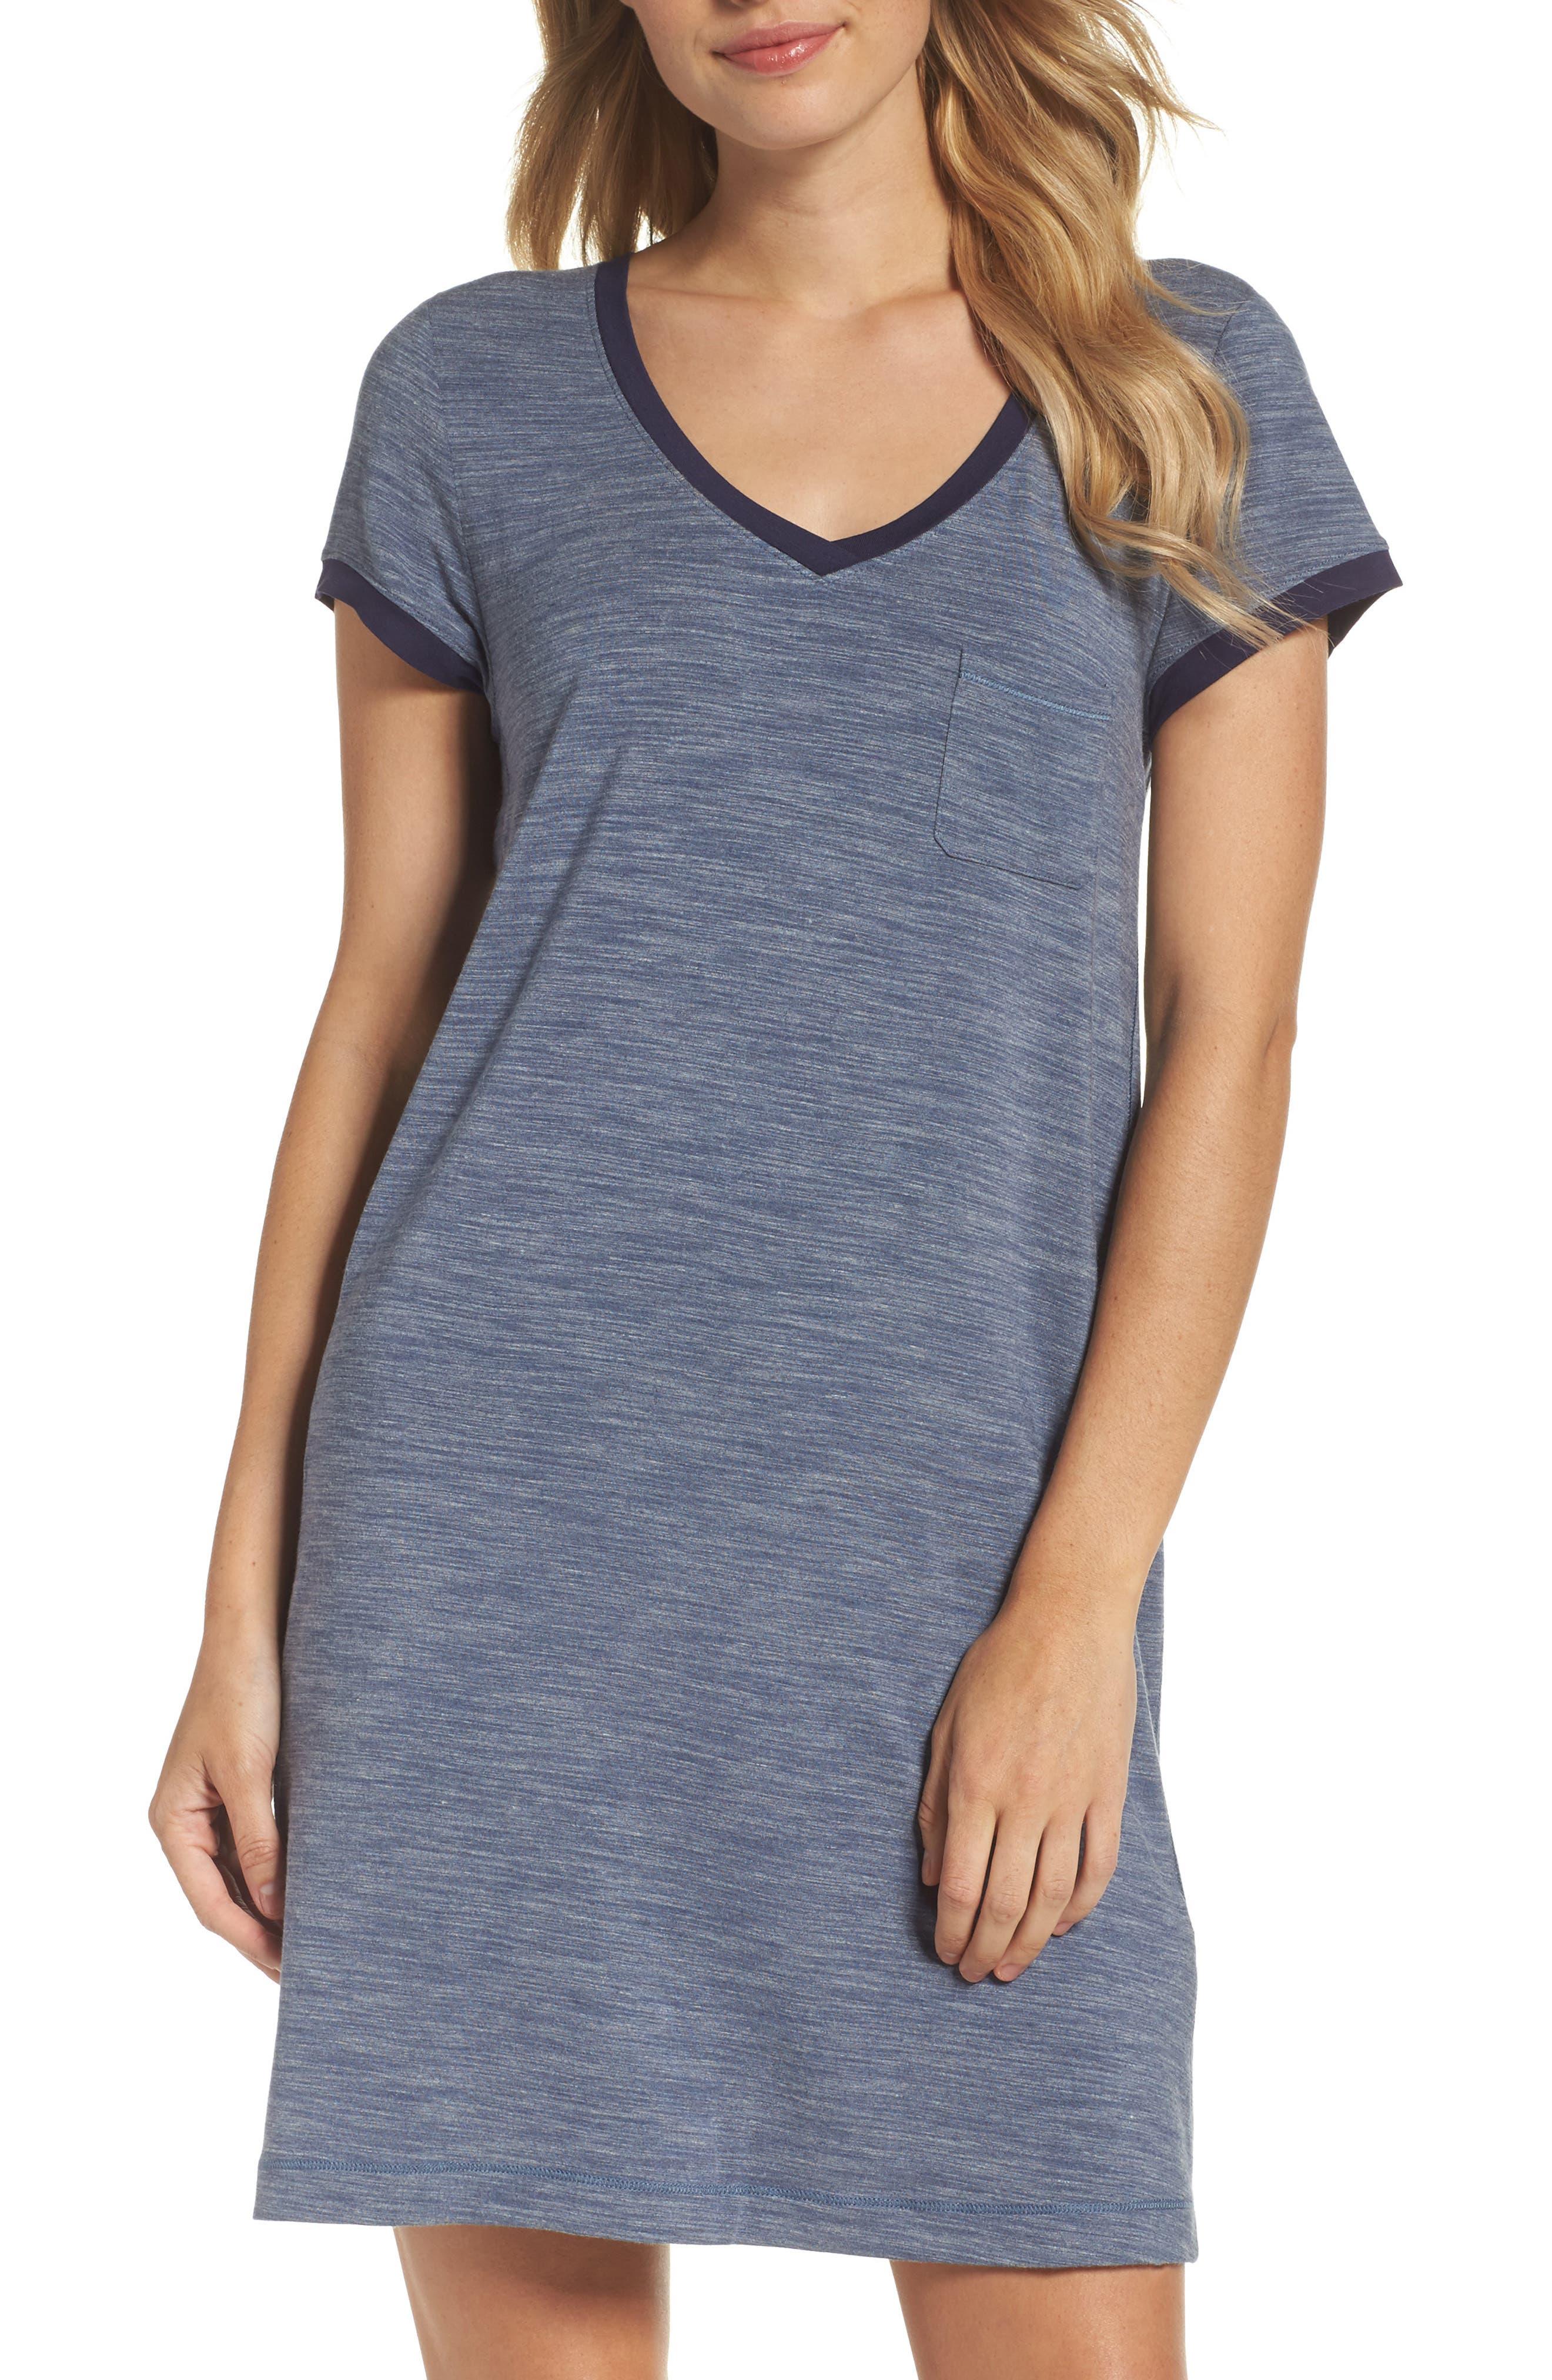 DKNY 'City Essential' Stripe Jersey Sleep Shirt